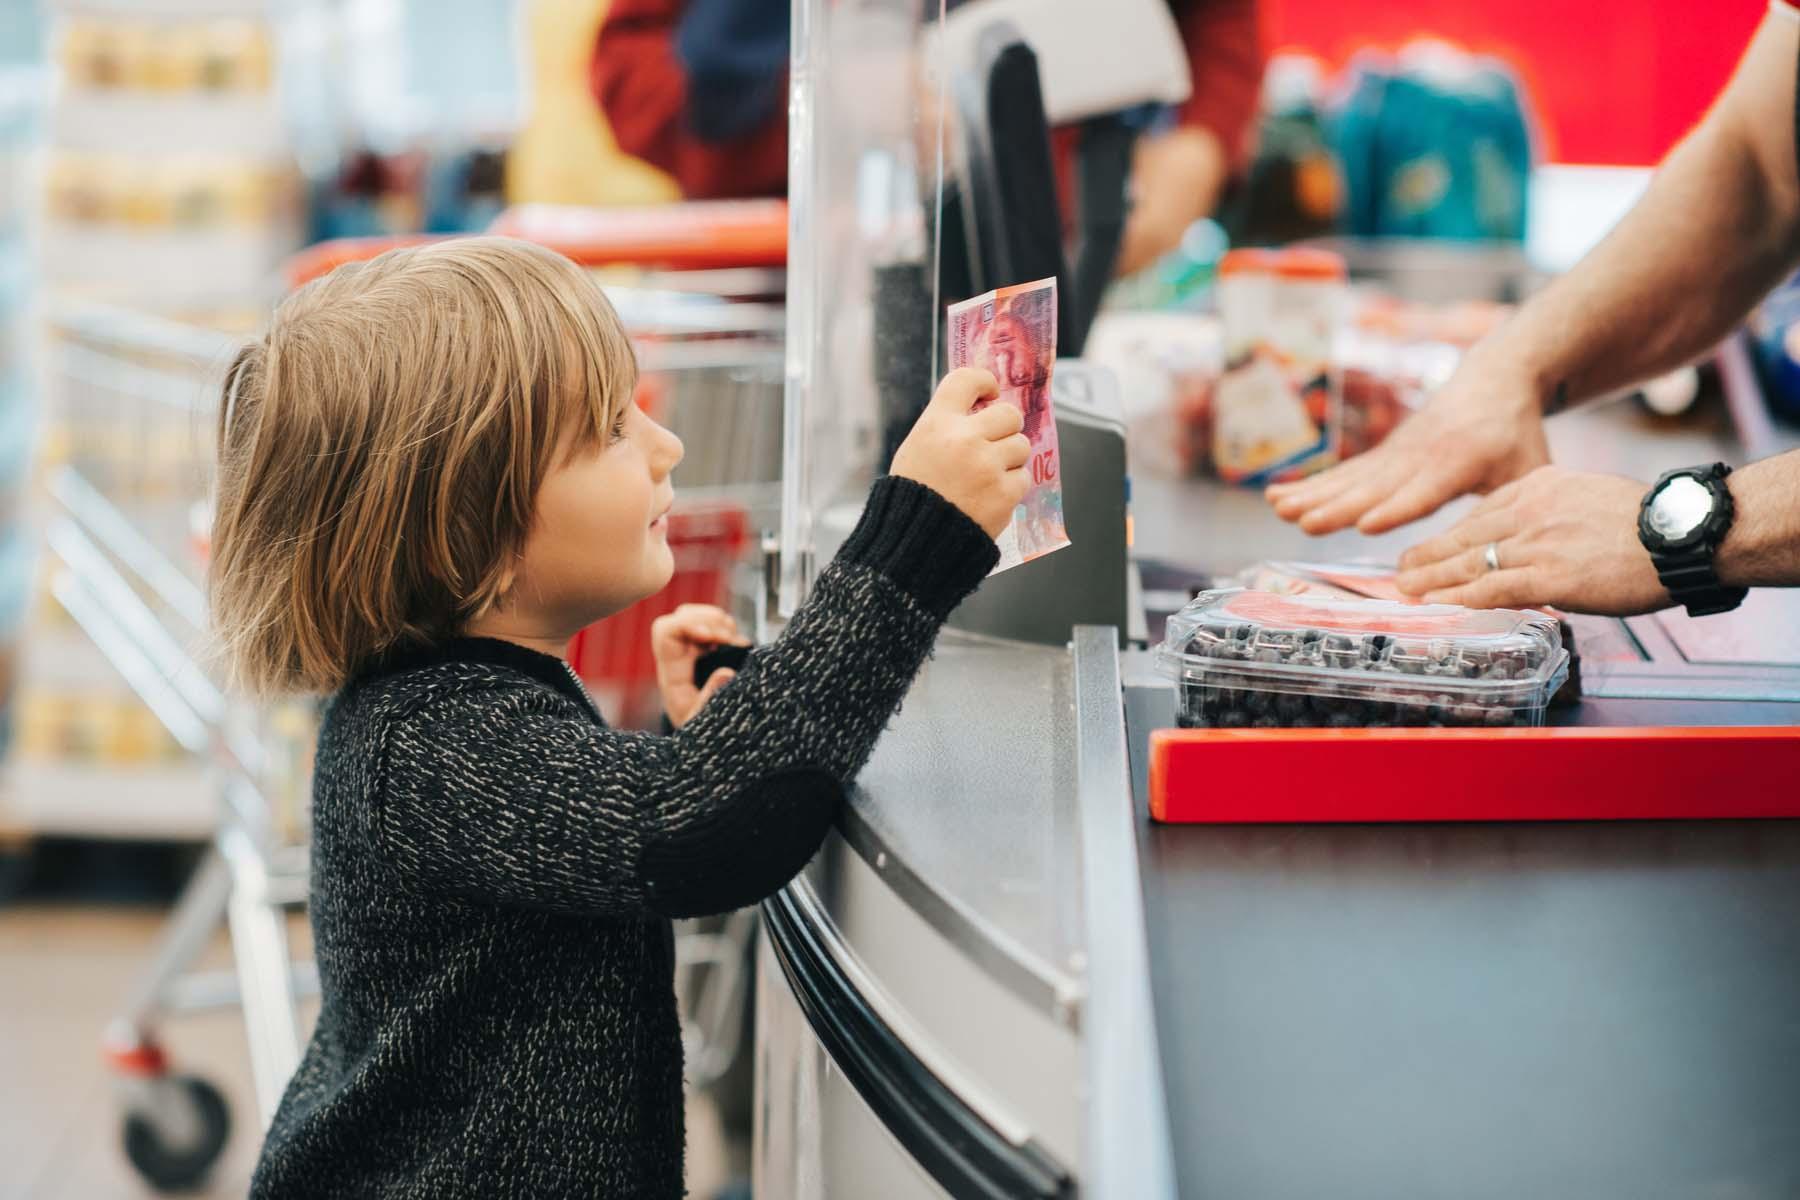 Boy paying Swiss supermarket